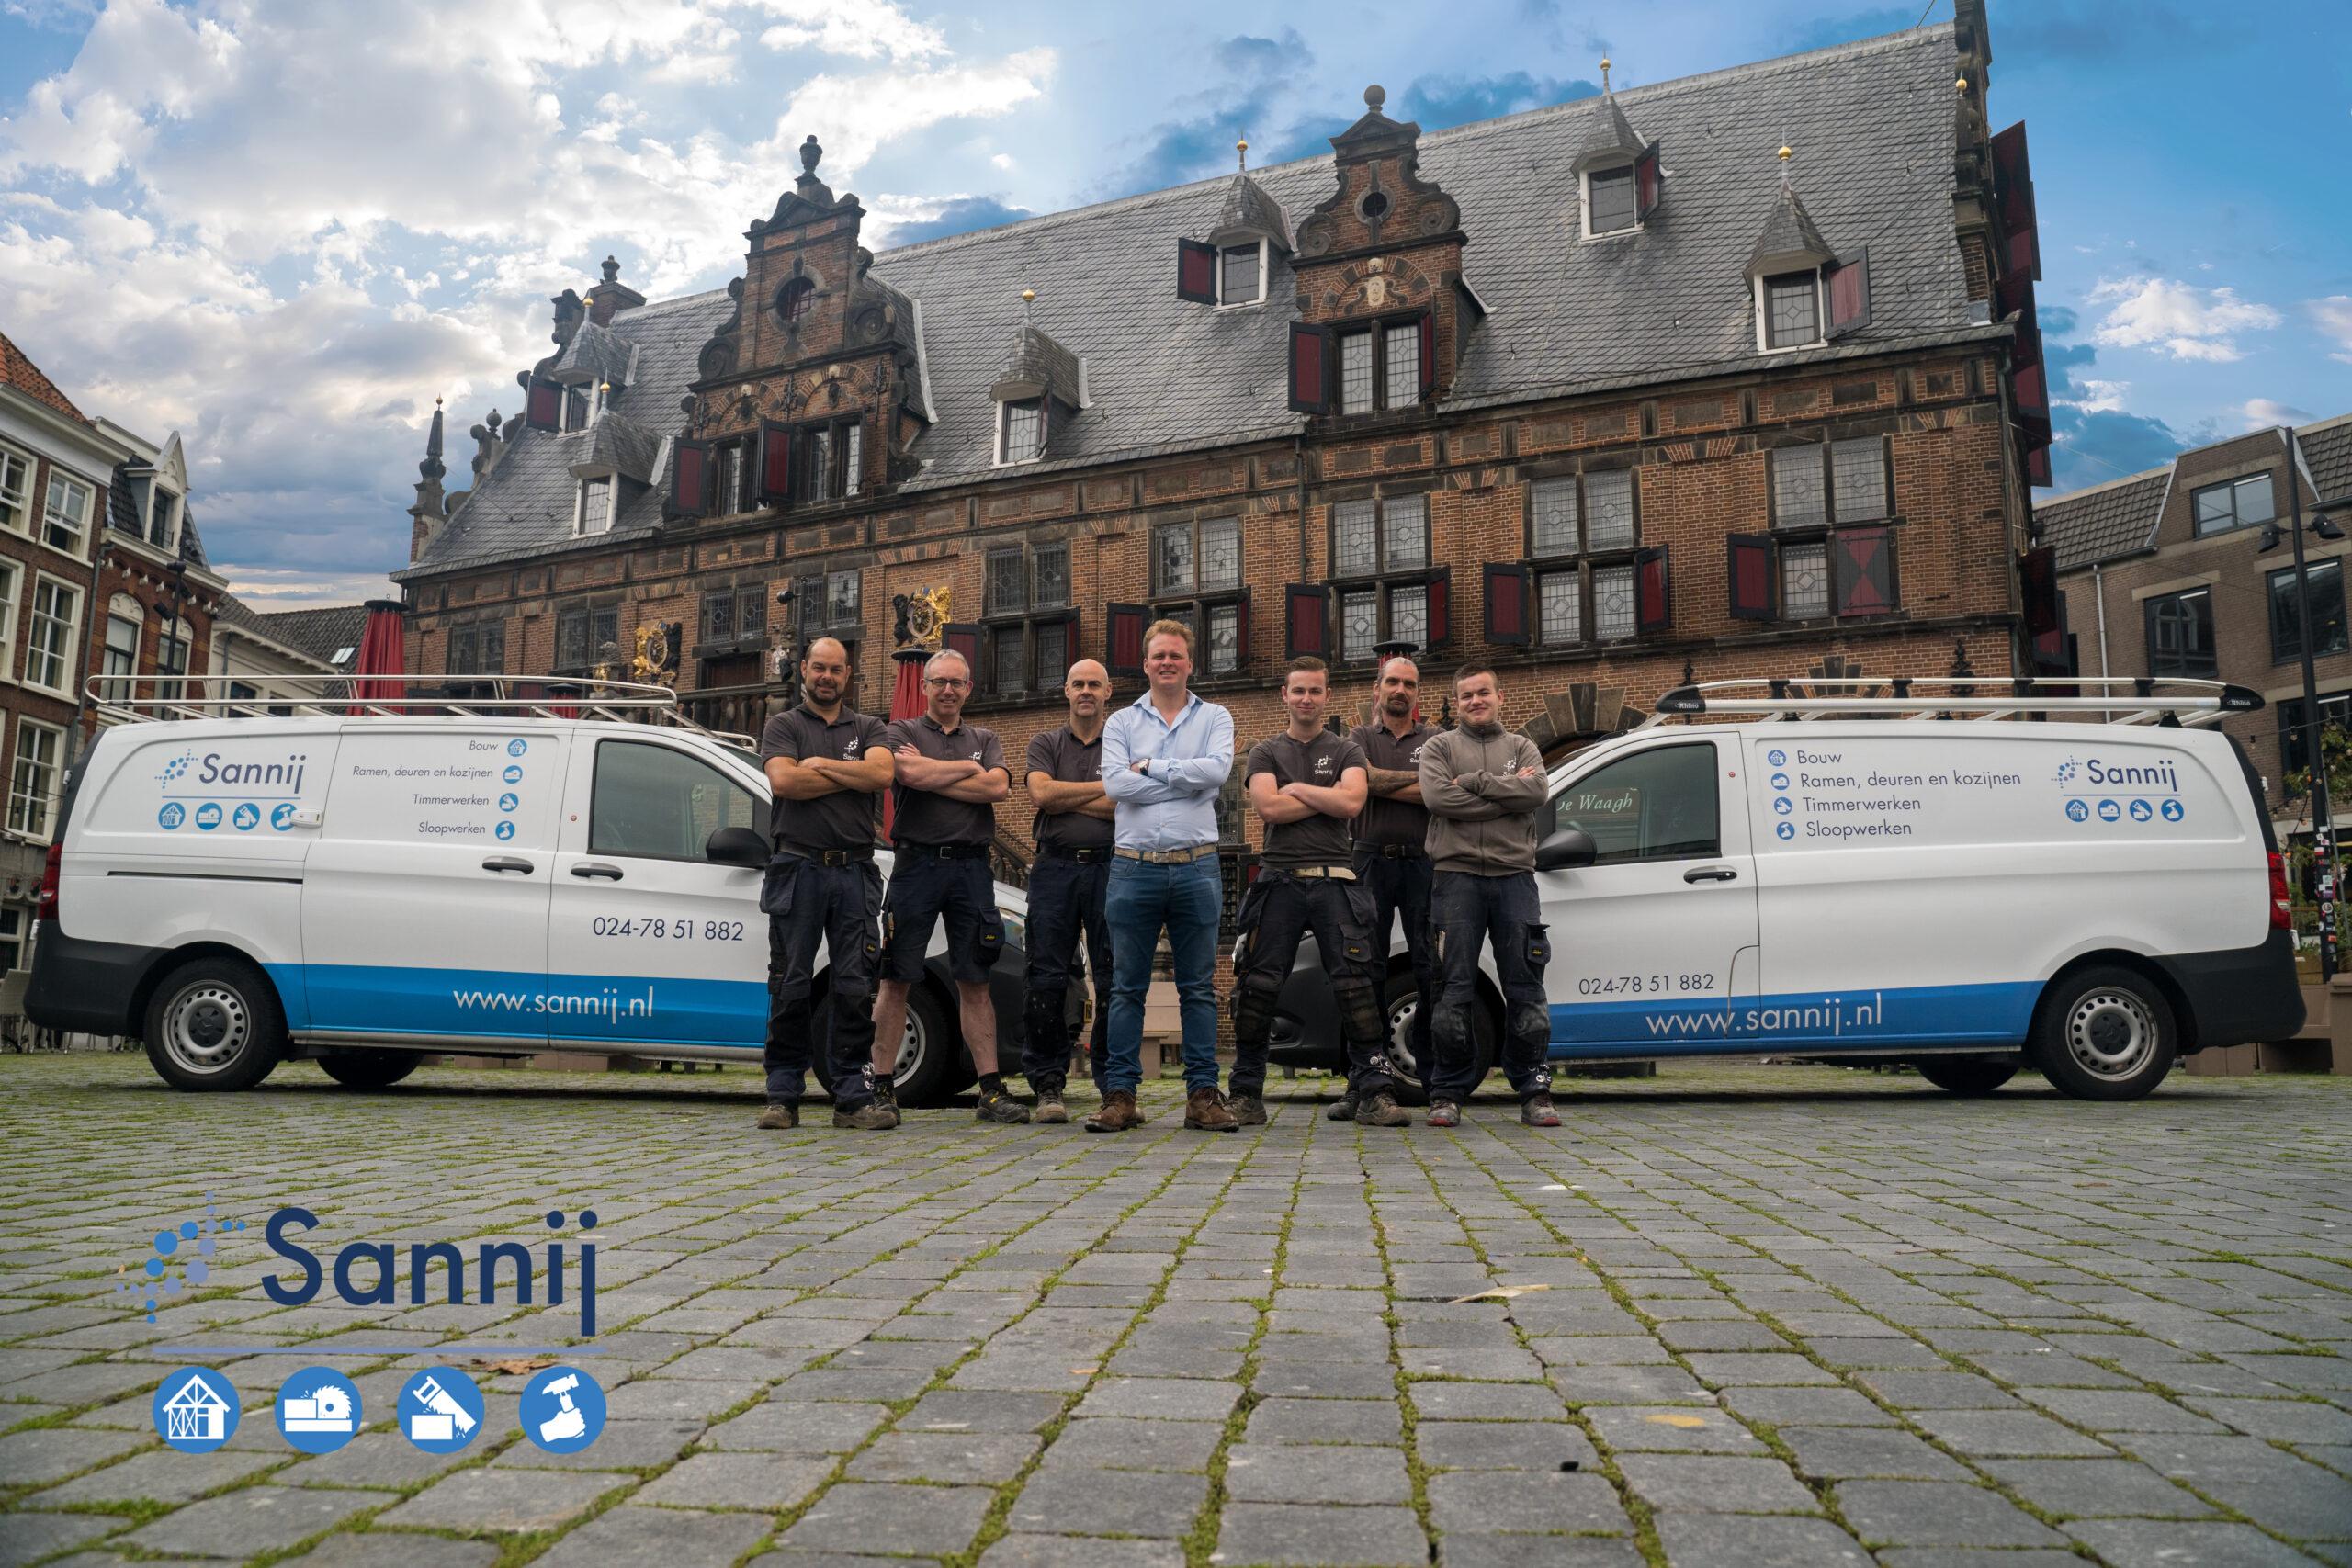 Sannij team